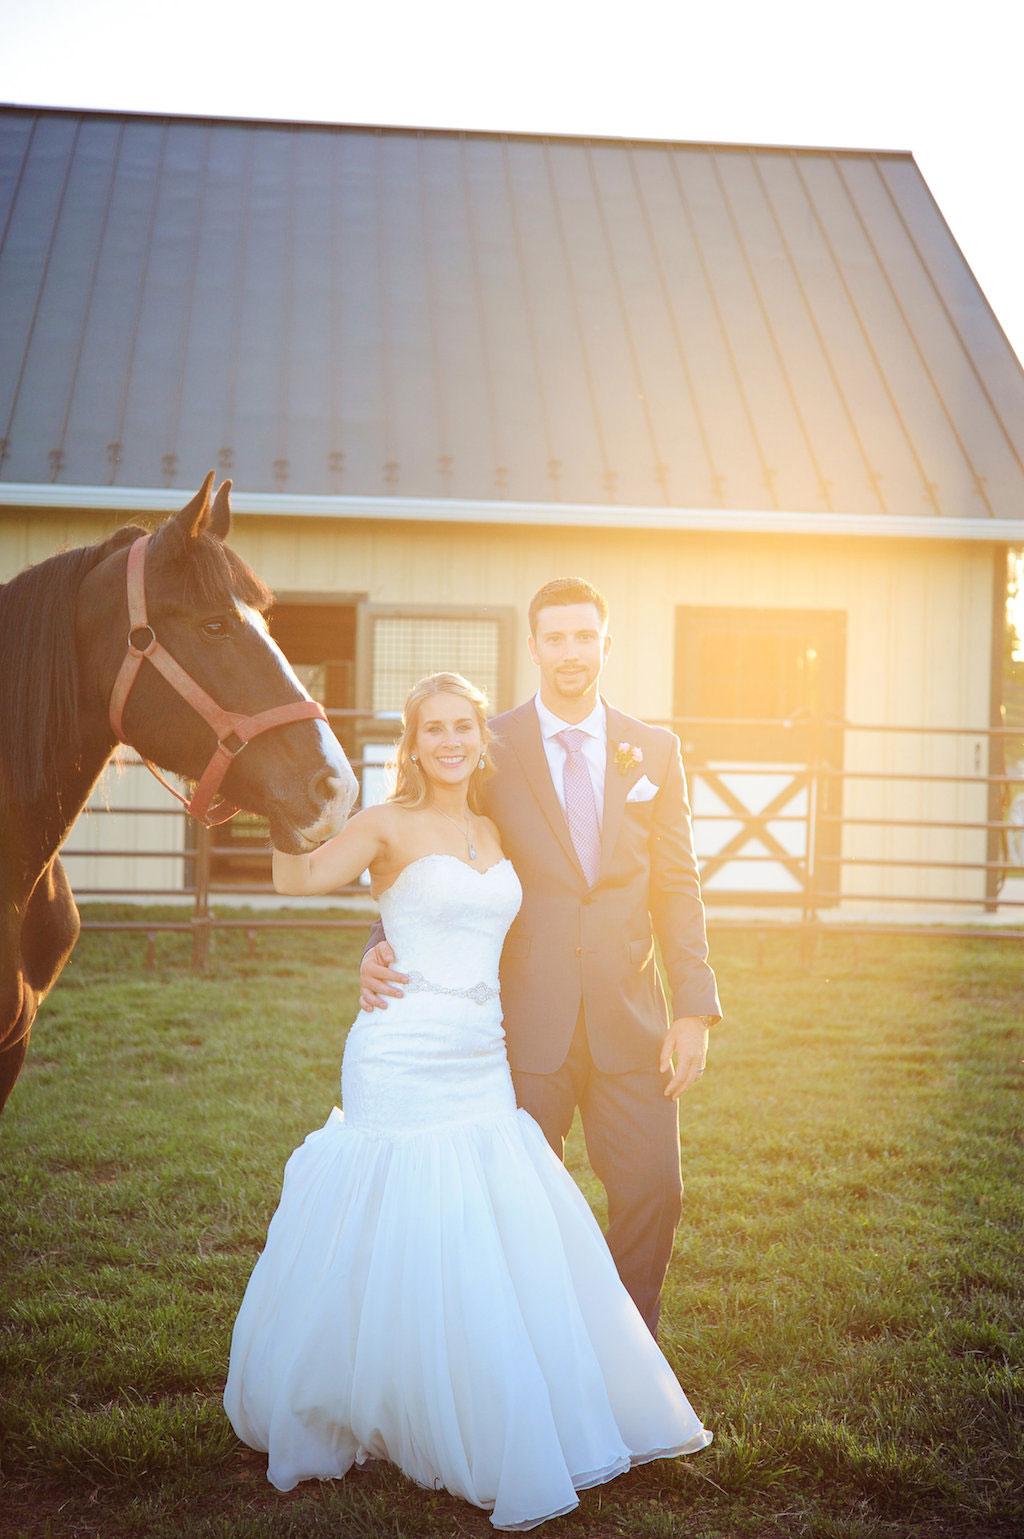 5-2-16-pink-wedding-horse-country-salamander-resort-9